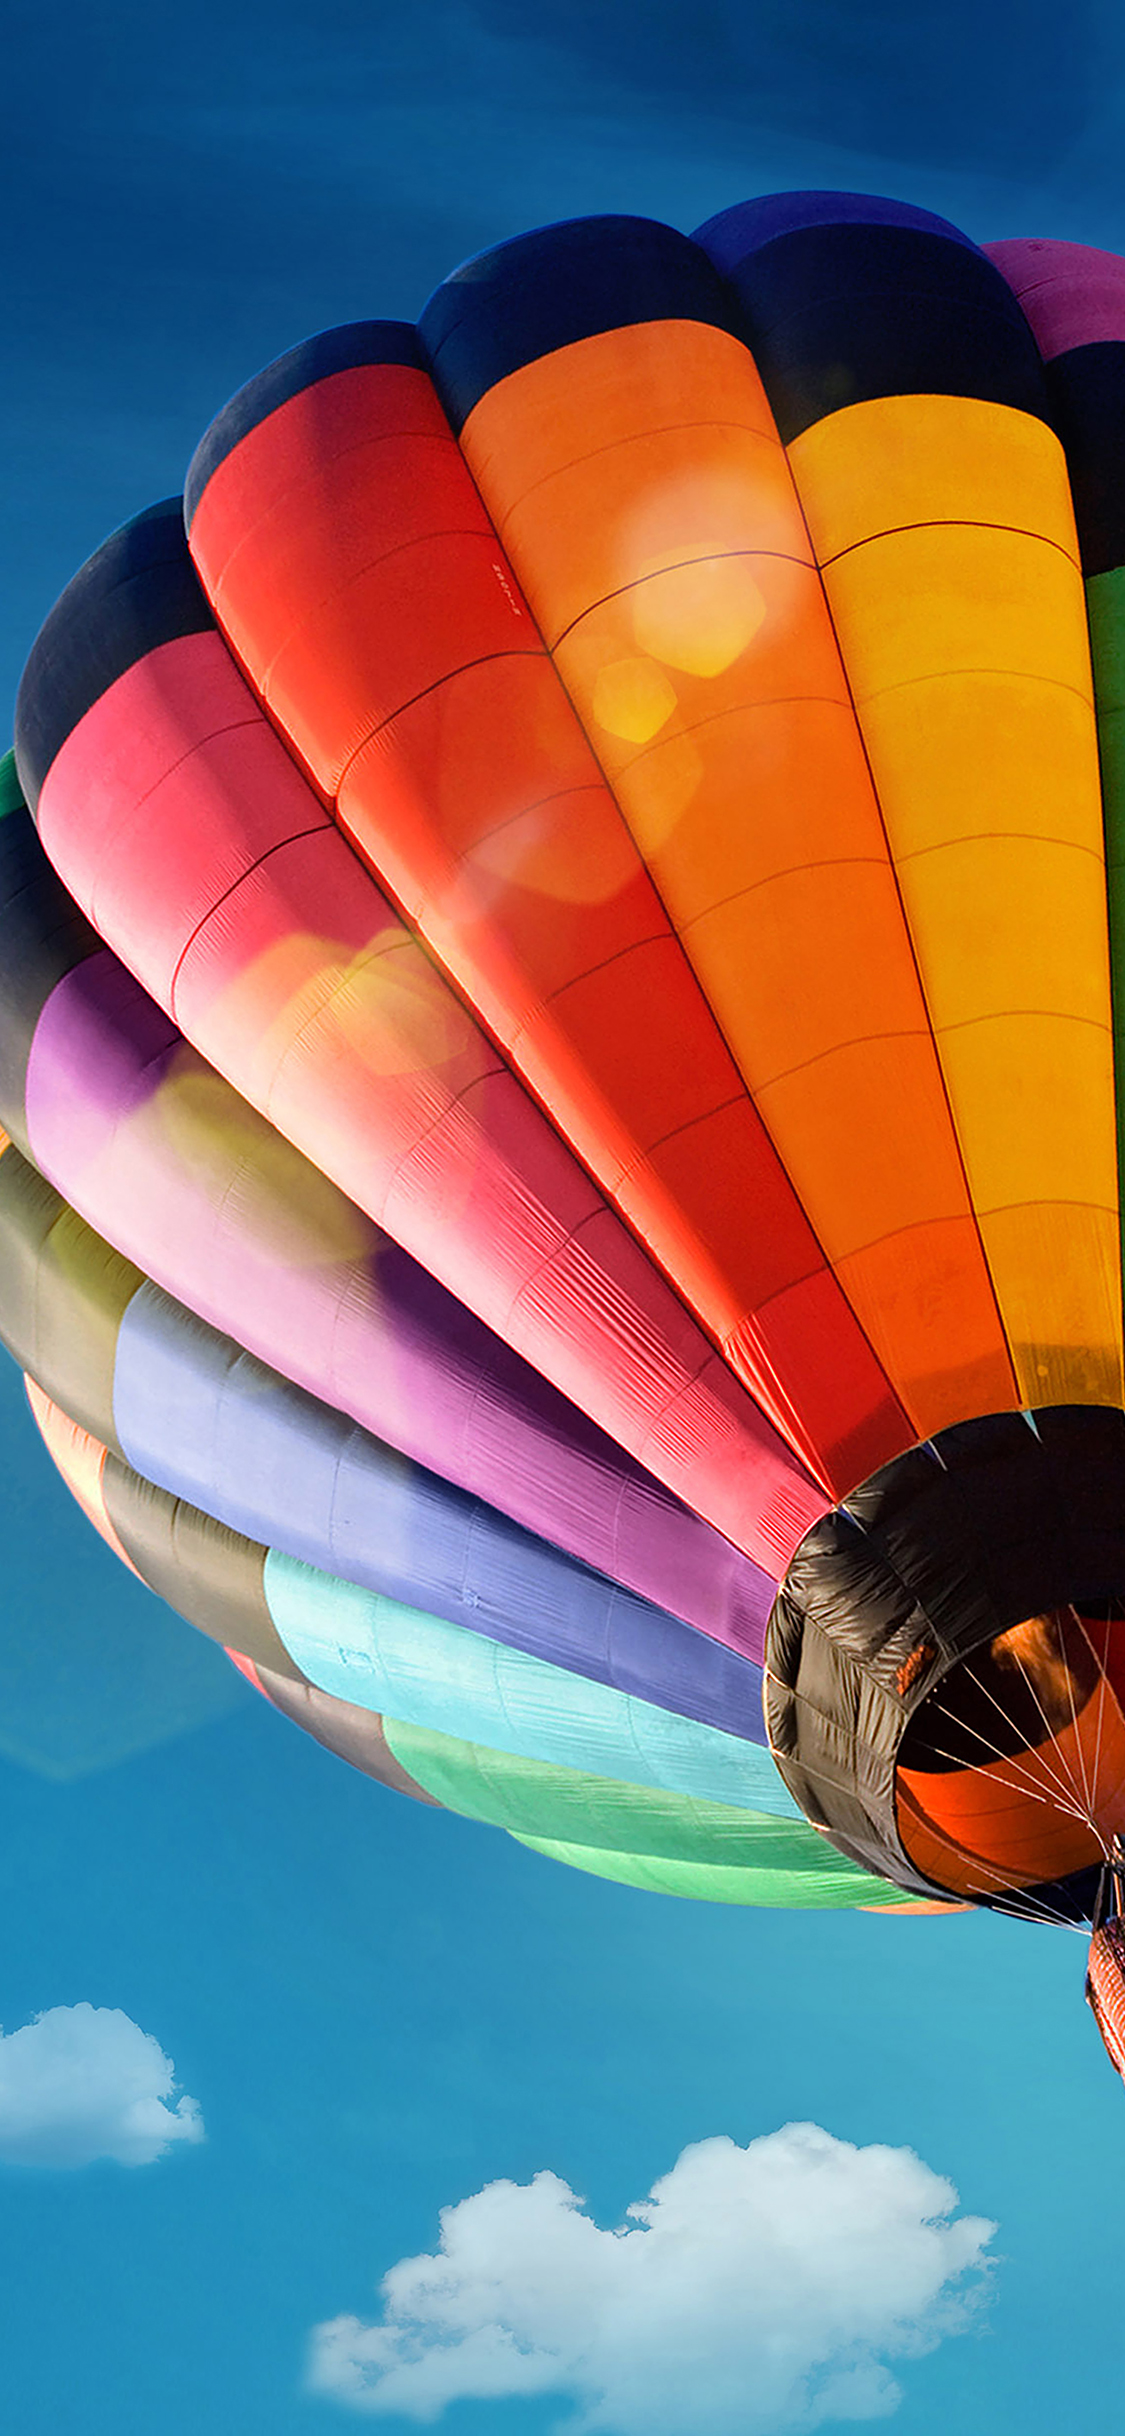 Disney Iphone X Wallpaper Mc17 Wallpaper Baloon Pretty Sky Wallpaper